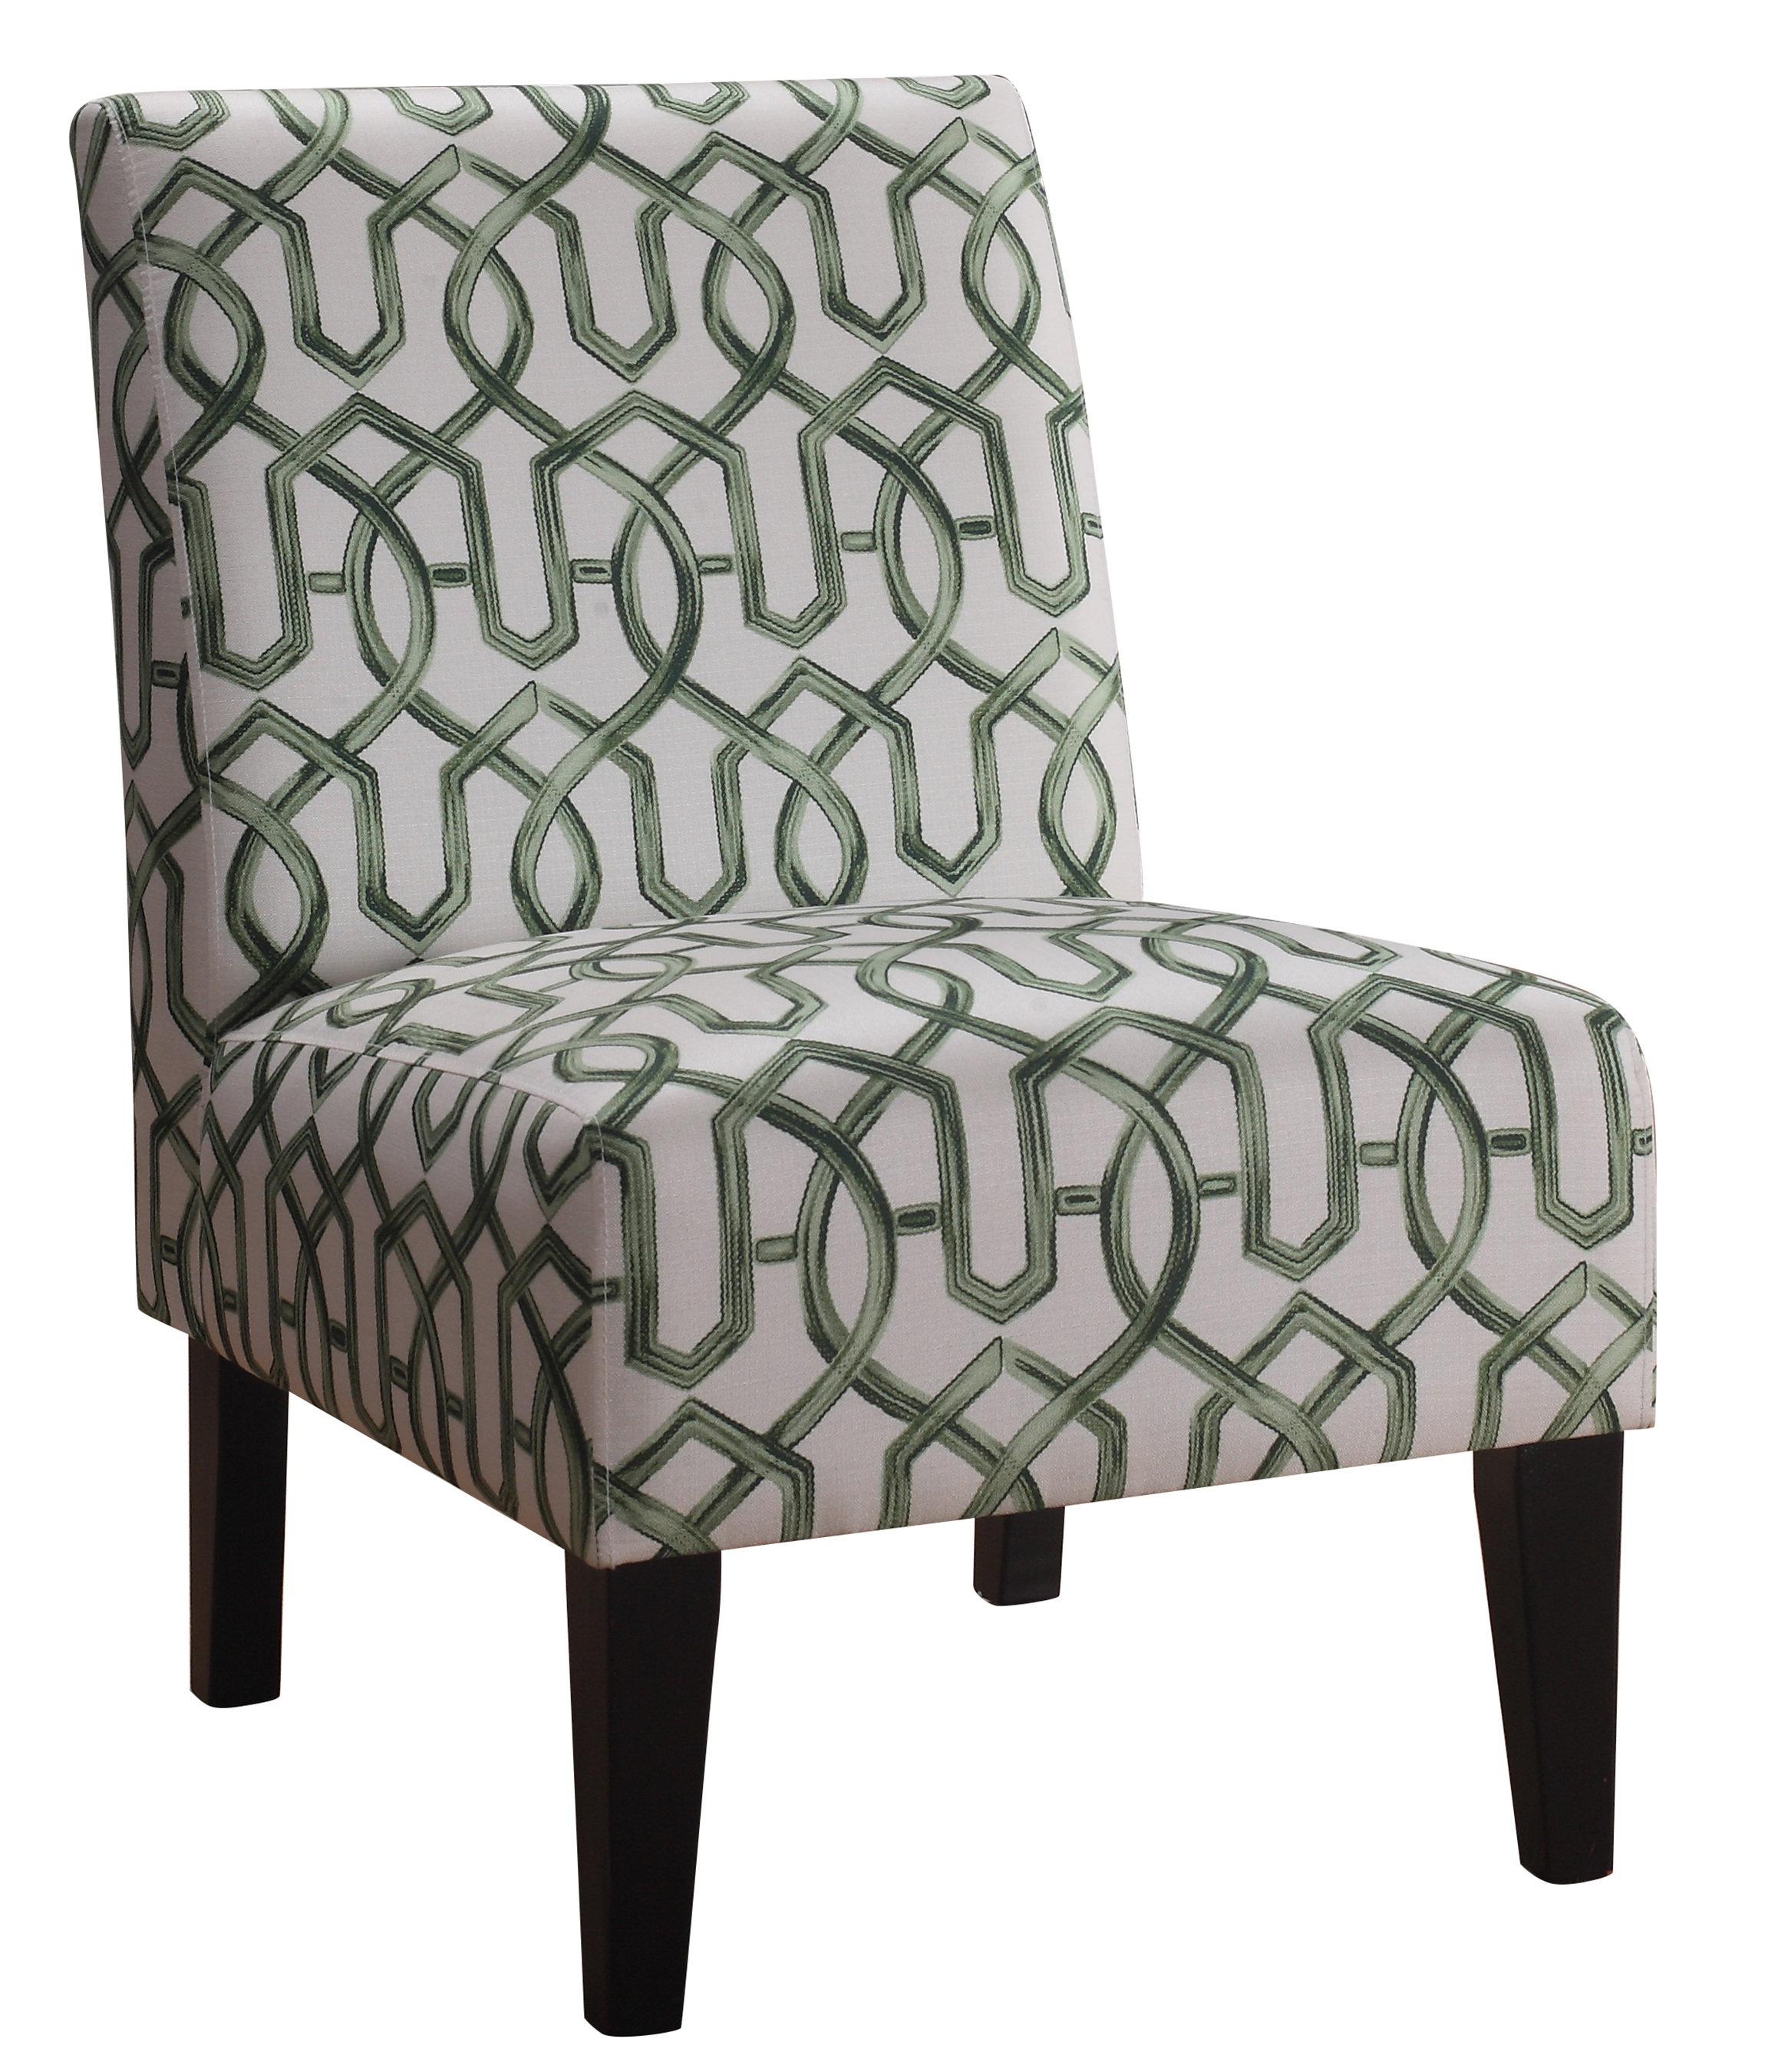 Genial INSTANT HOME Karina Slipper Chair U0026 Reviews | Wayfair